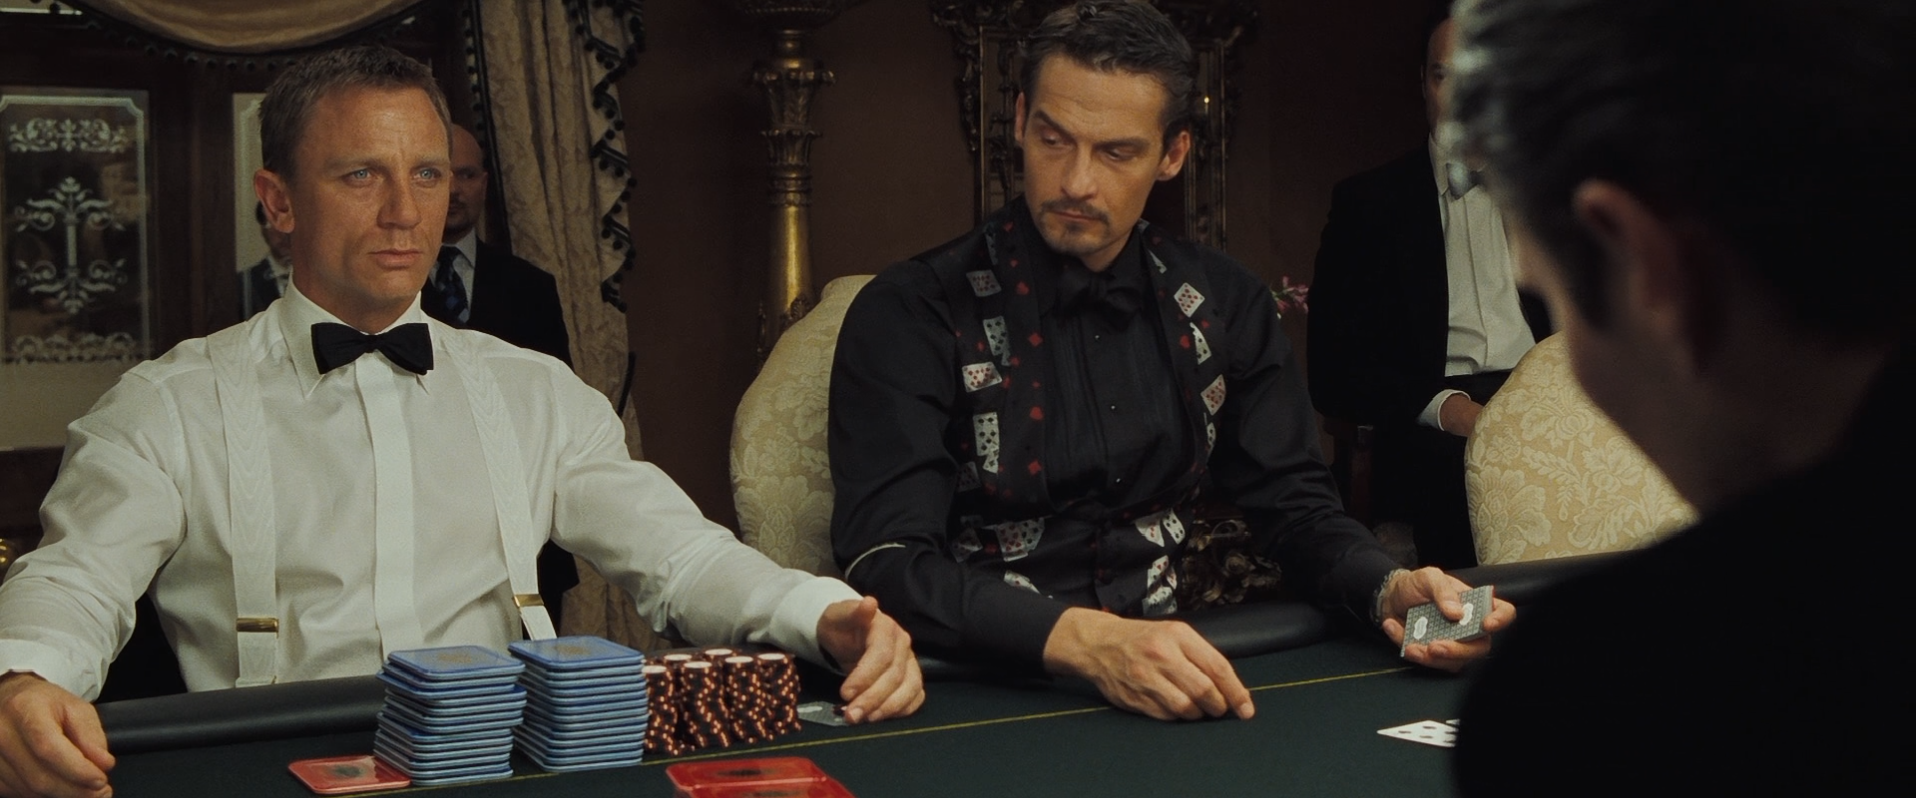 Online 007 casino royale 50 lions slot machine free online